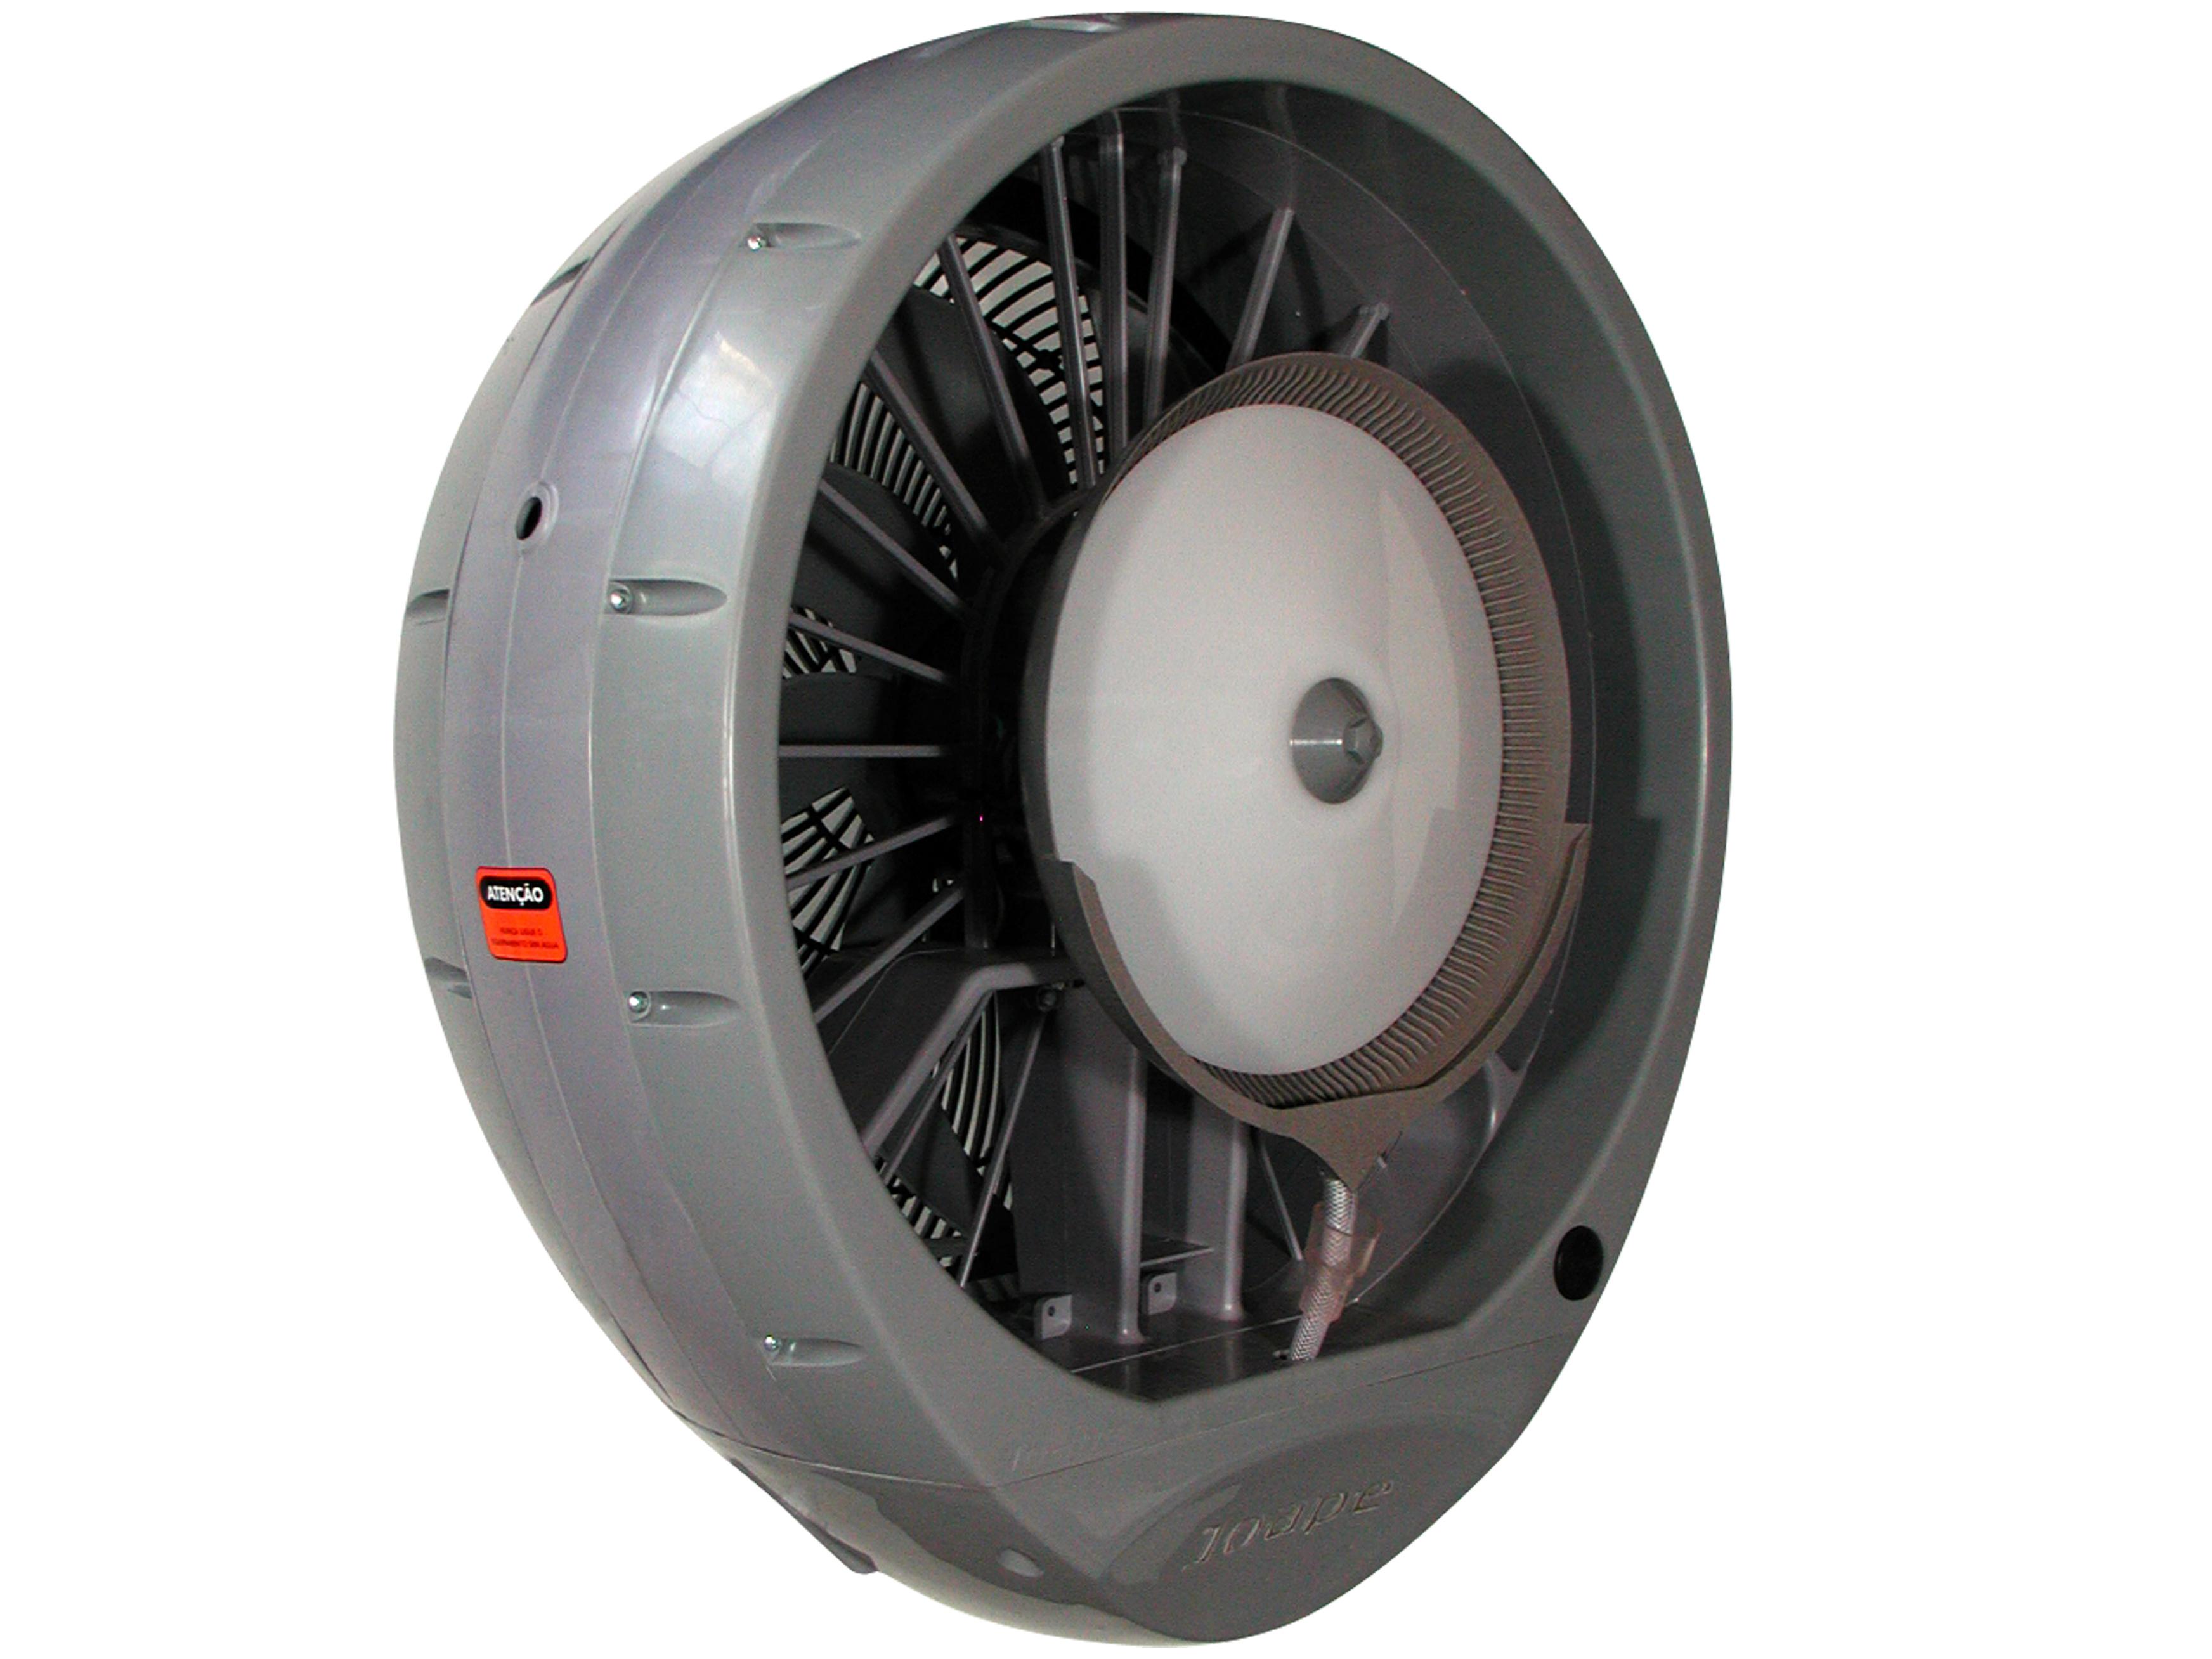 Climatizador joape guaruj para at 200m safeshop - Climatizador de agua ...